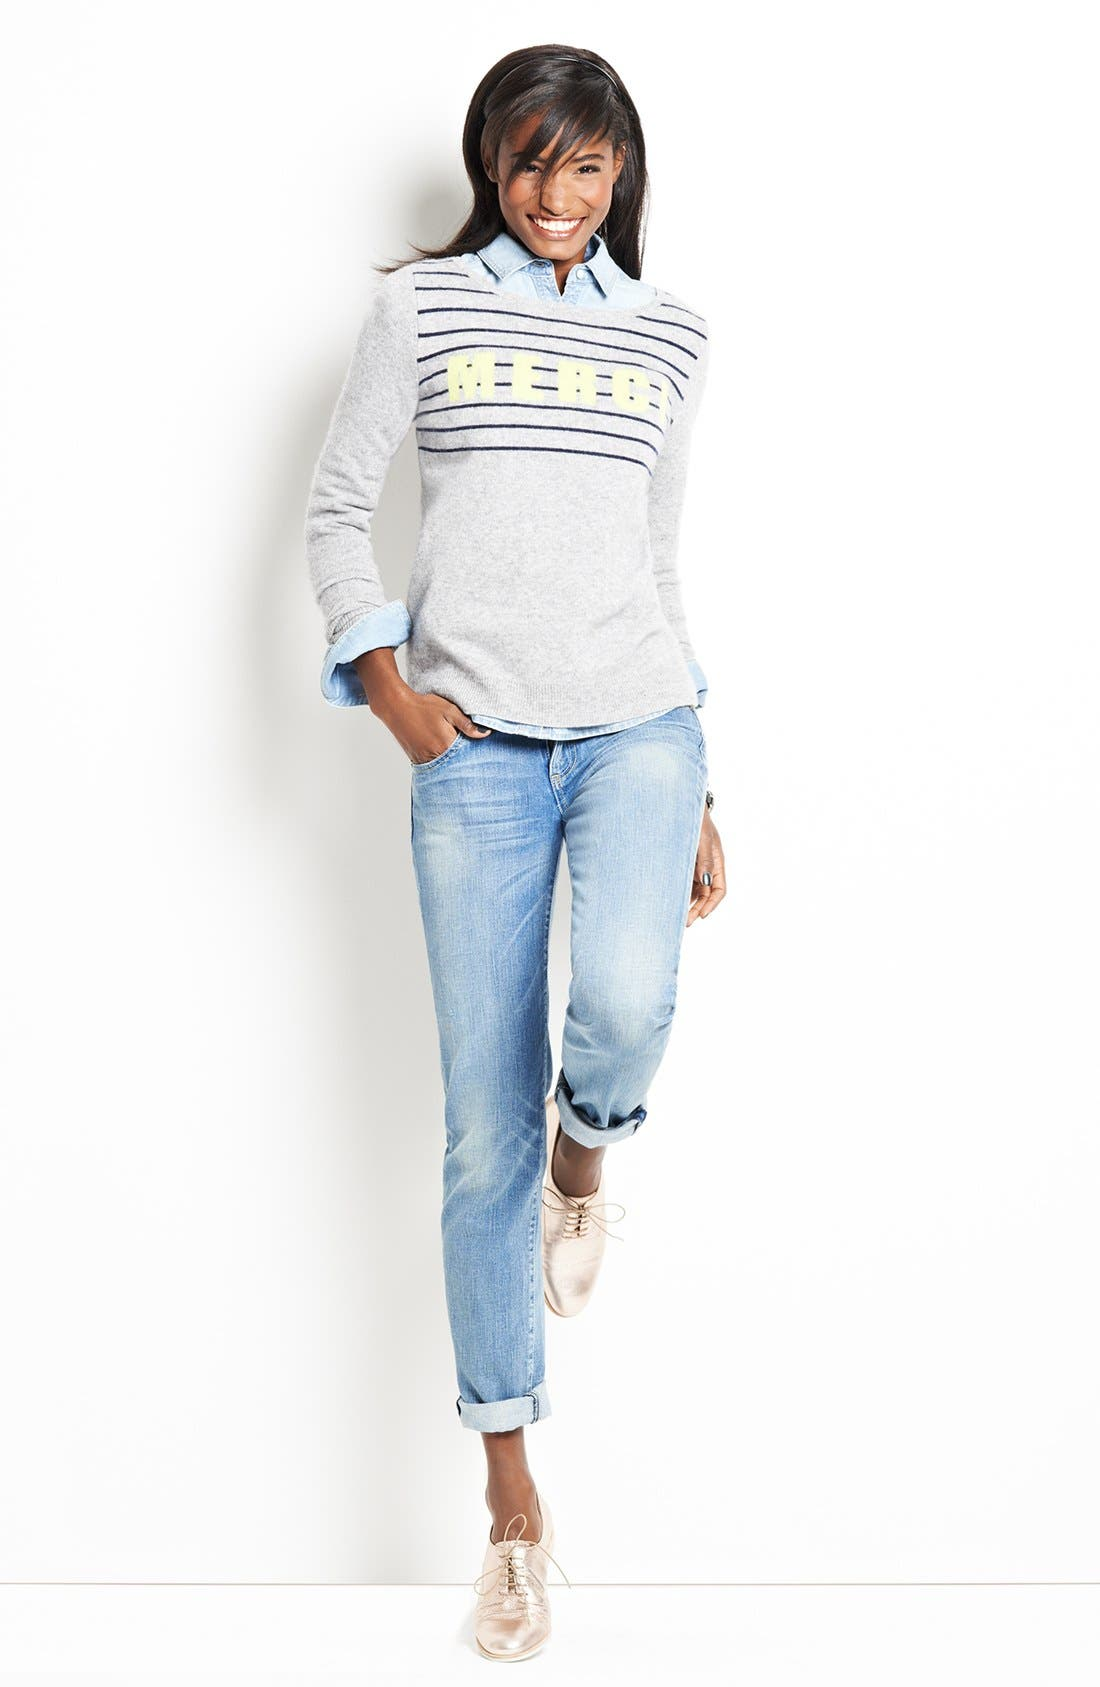 Alternate Image 1 Selected - Halogen® Intarsia Sweater & KUT from the Kloth Boyfriend Jeans